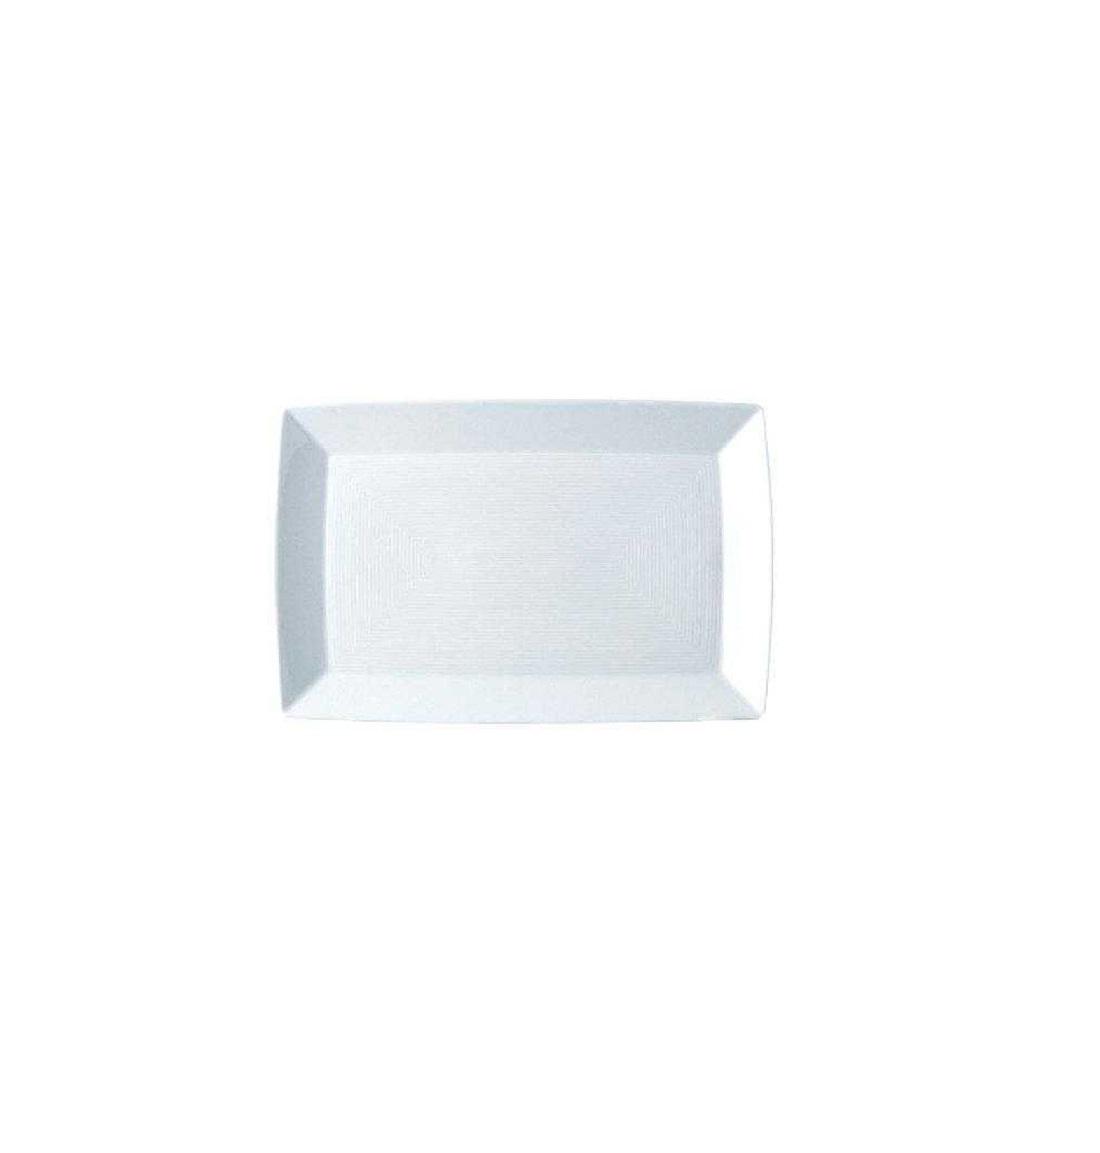 Блюдо фарфоровое Rosenthal LOFT, 28,5х18,5 см, белый Rosenthal 11900-800001-12928 фото 1